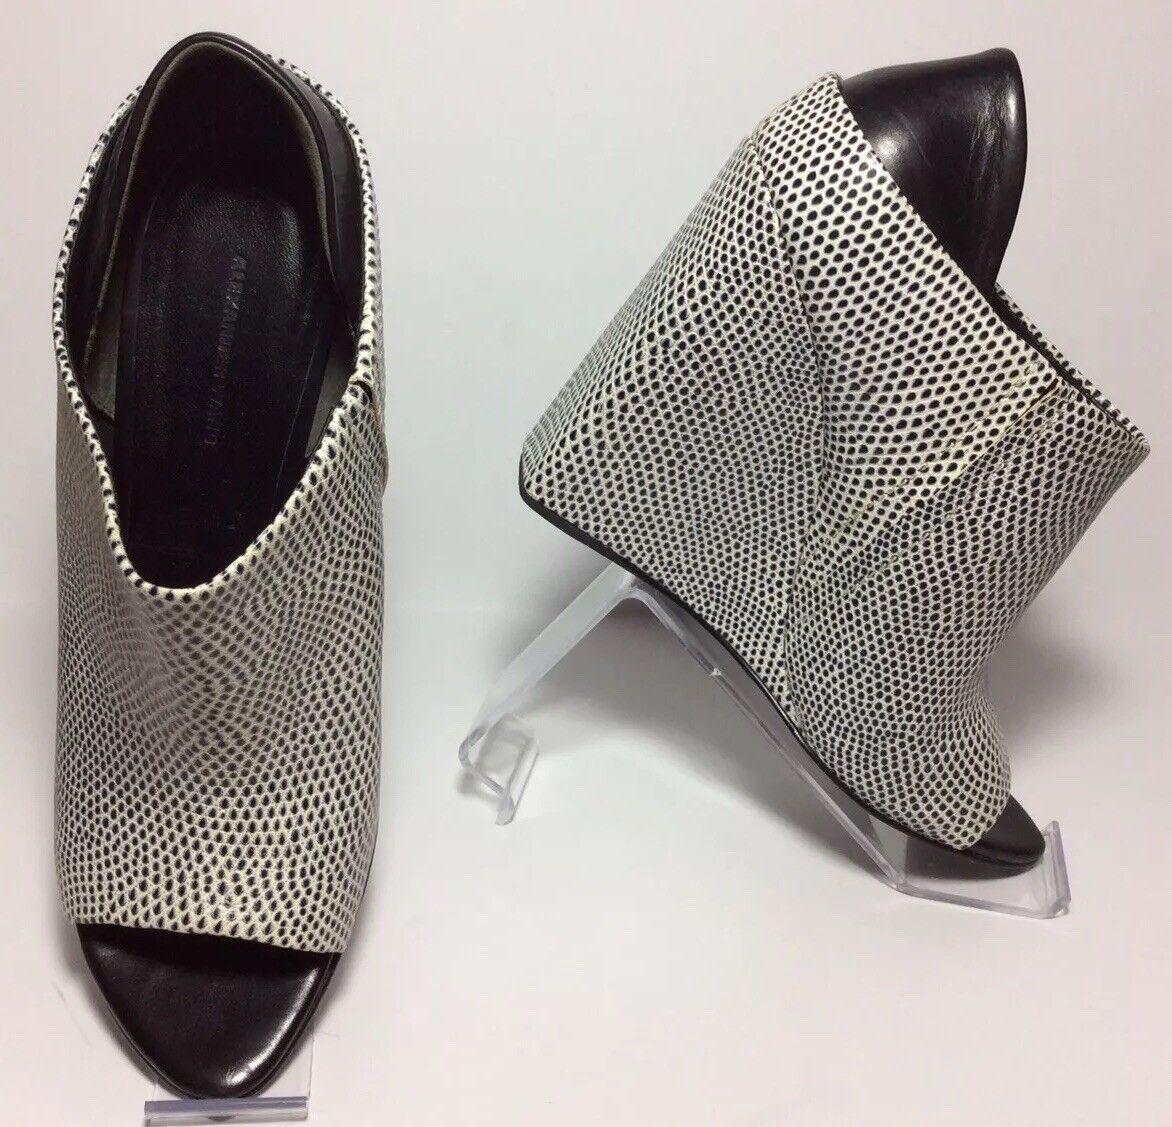 Alexander Wang  715 Alla Leather Cuñas Talla 38 se se se ajusta Sz 7 Negro Y blancoooo 50b368